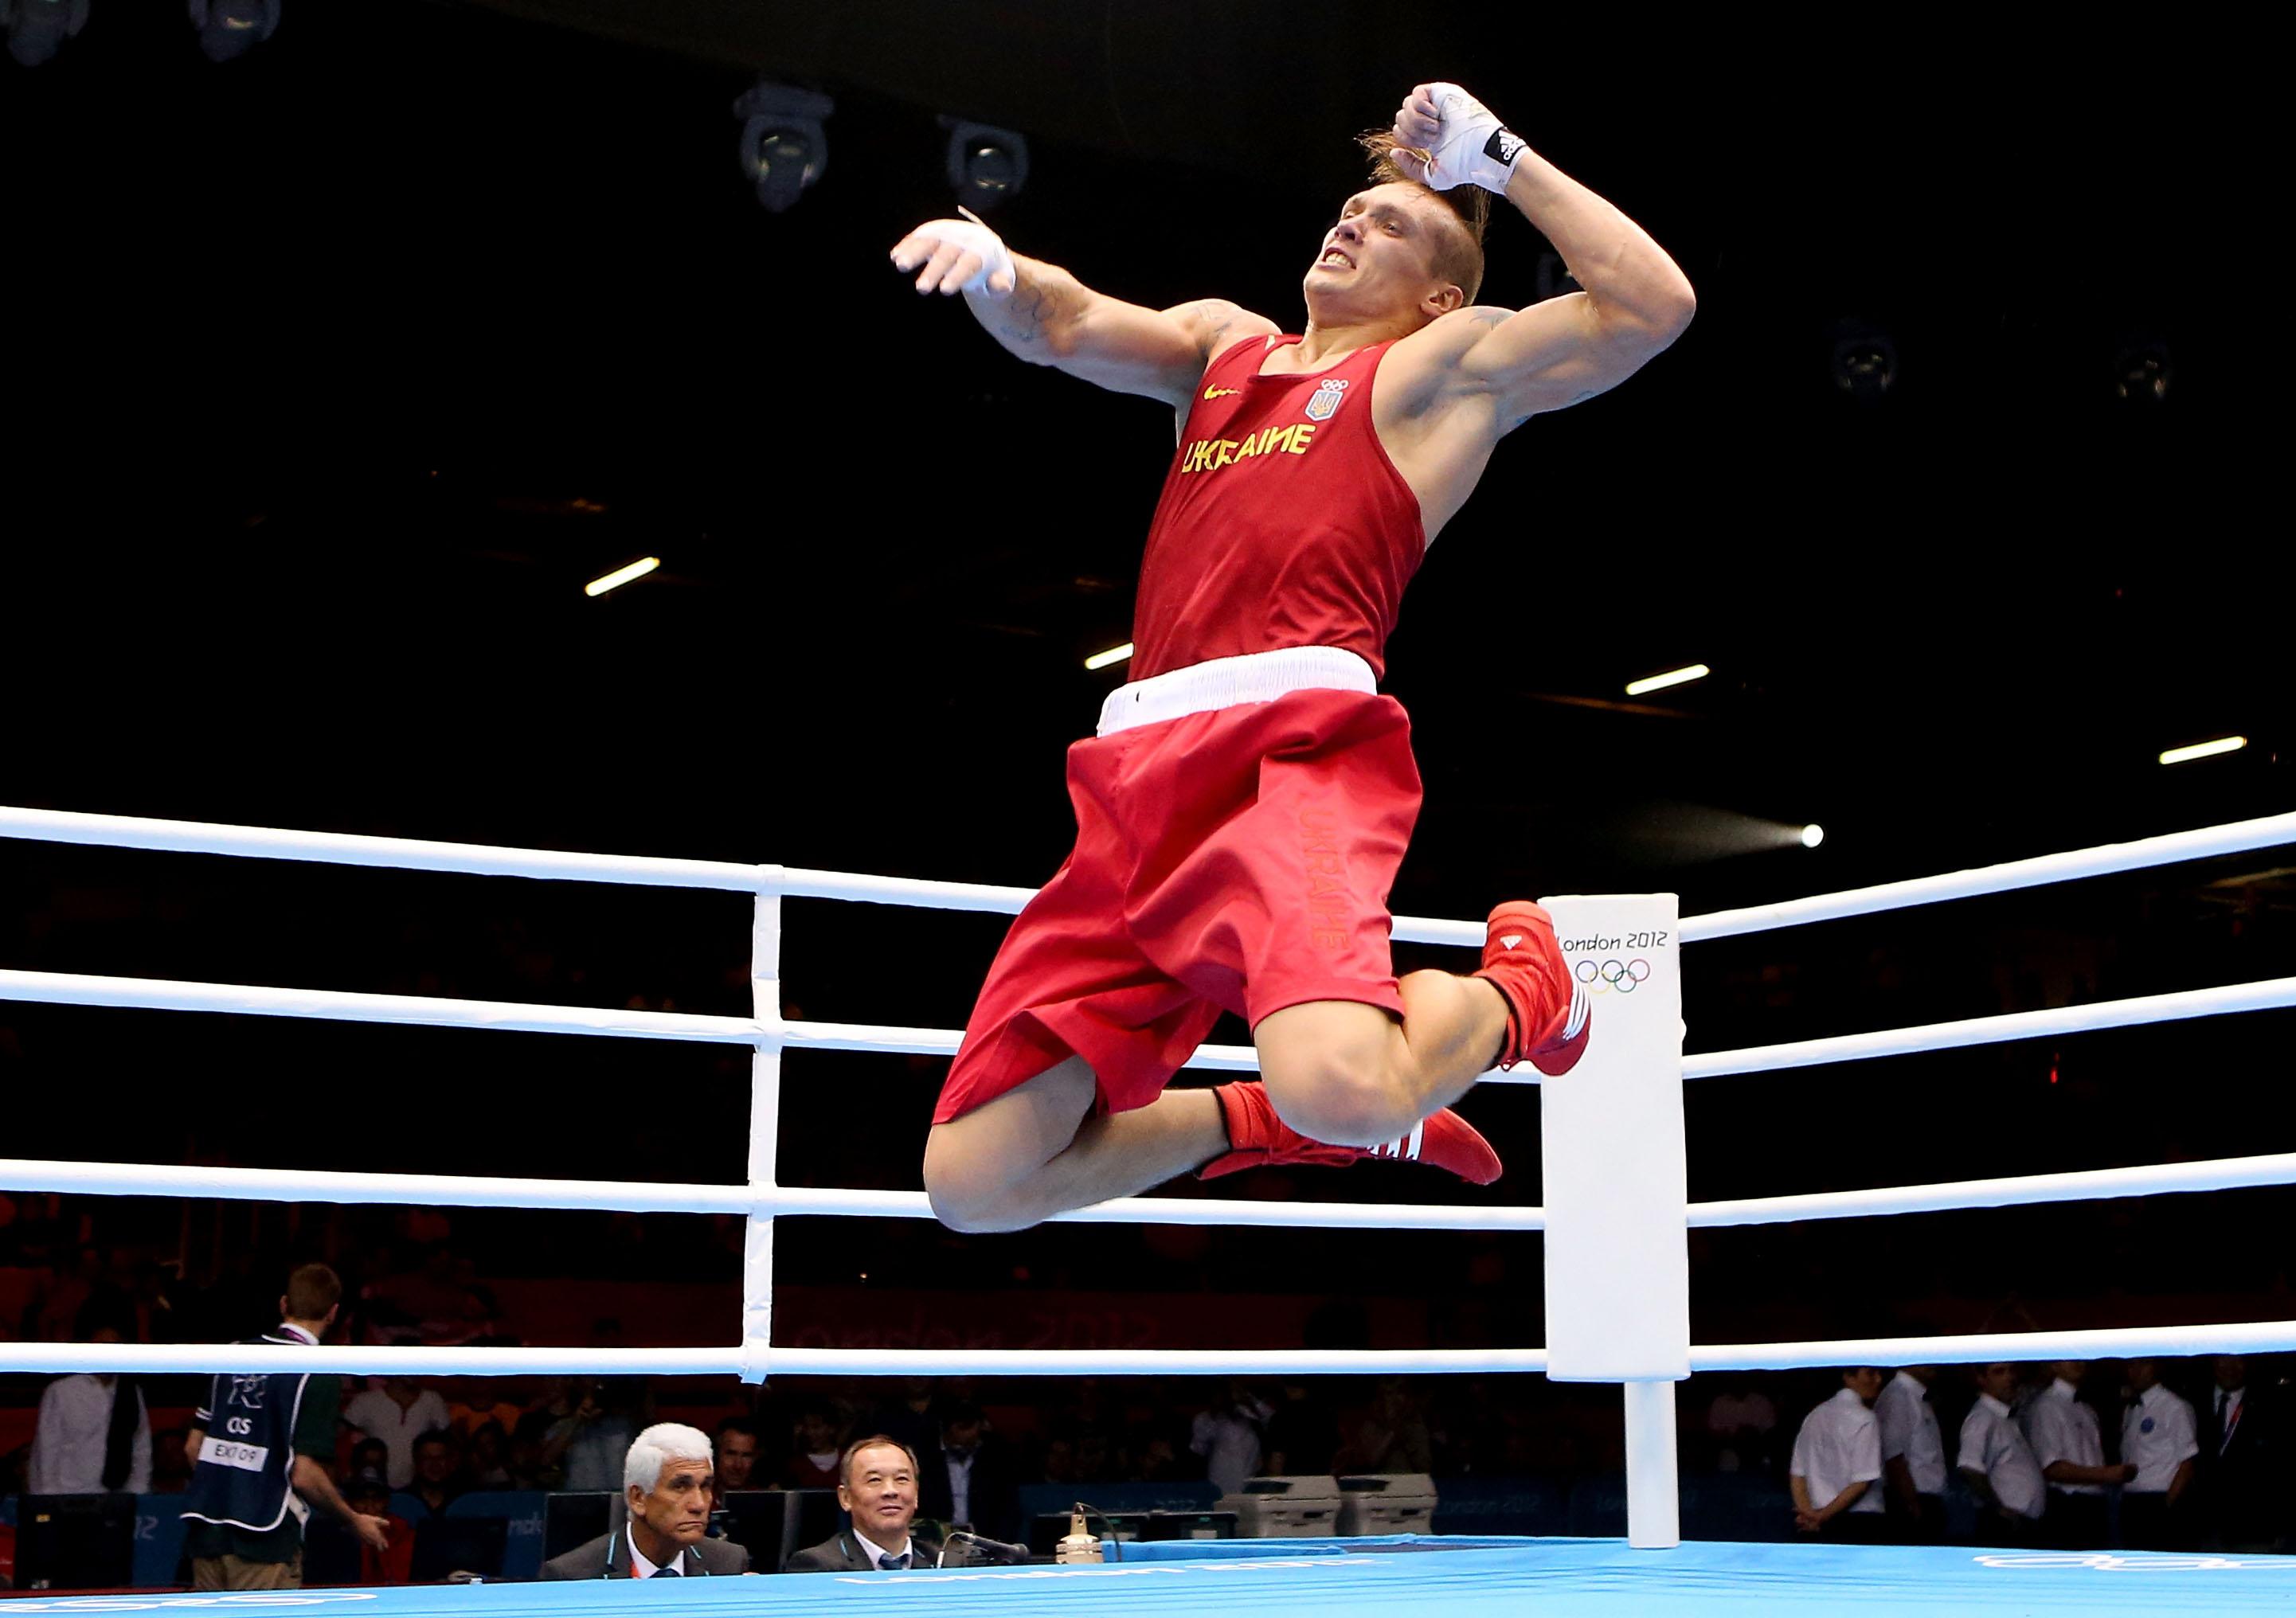 Триумф Александра Усика на Олимпиаде в Лондоне 2012